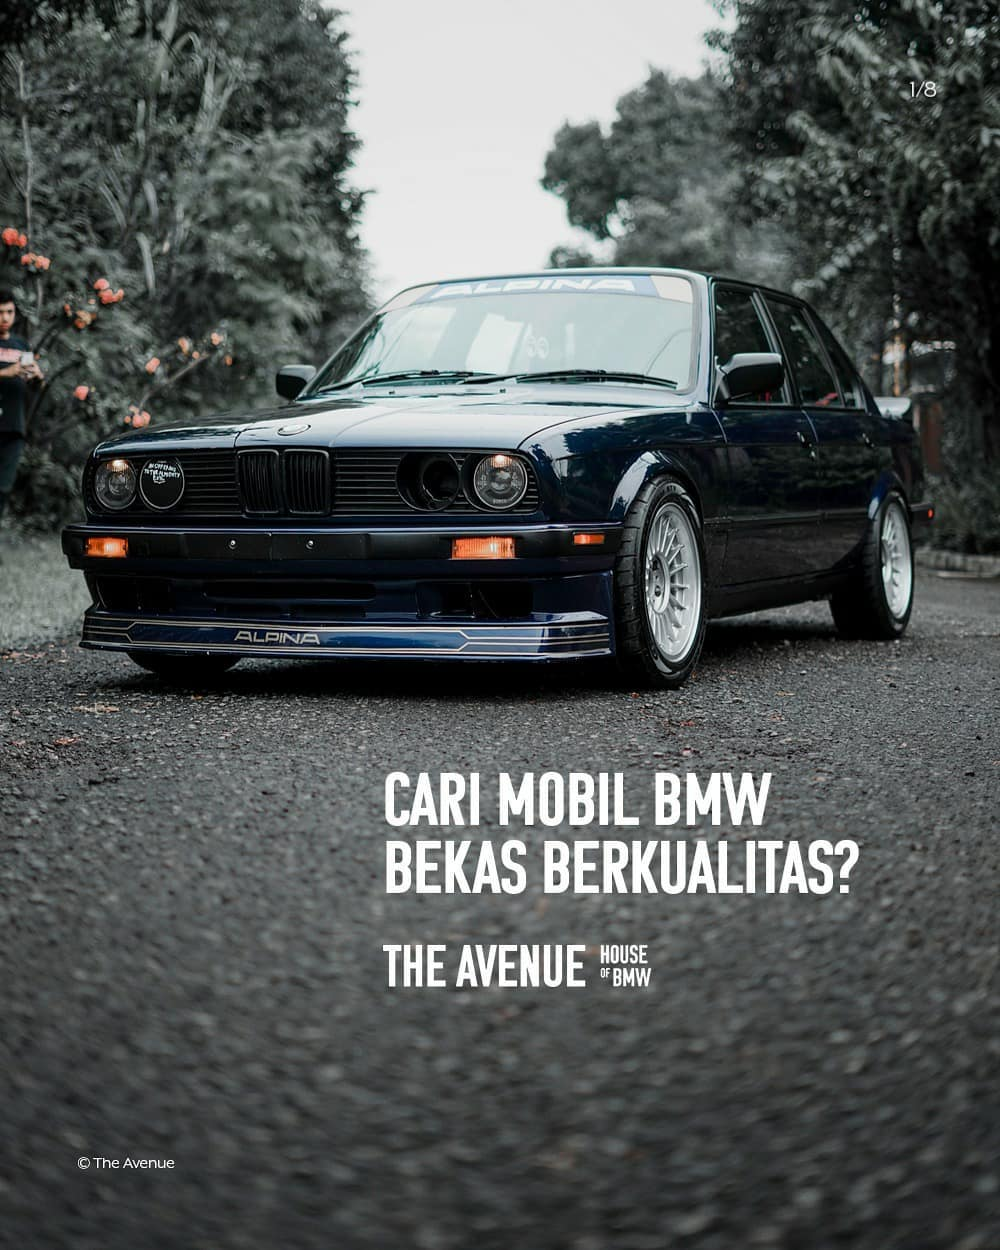 Bapak-bapak yang lagi nyari BMW second yang terawat, good looking serta berkualitas dapat cek ke l…